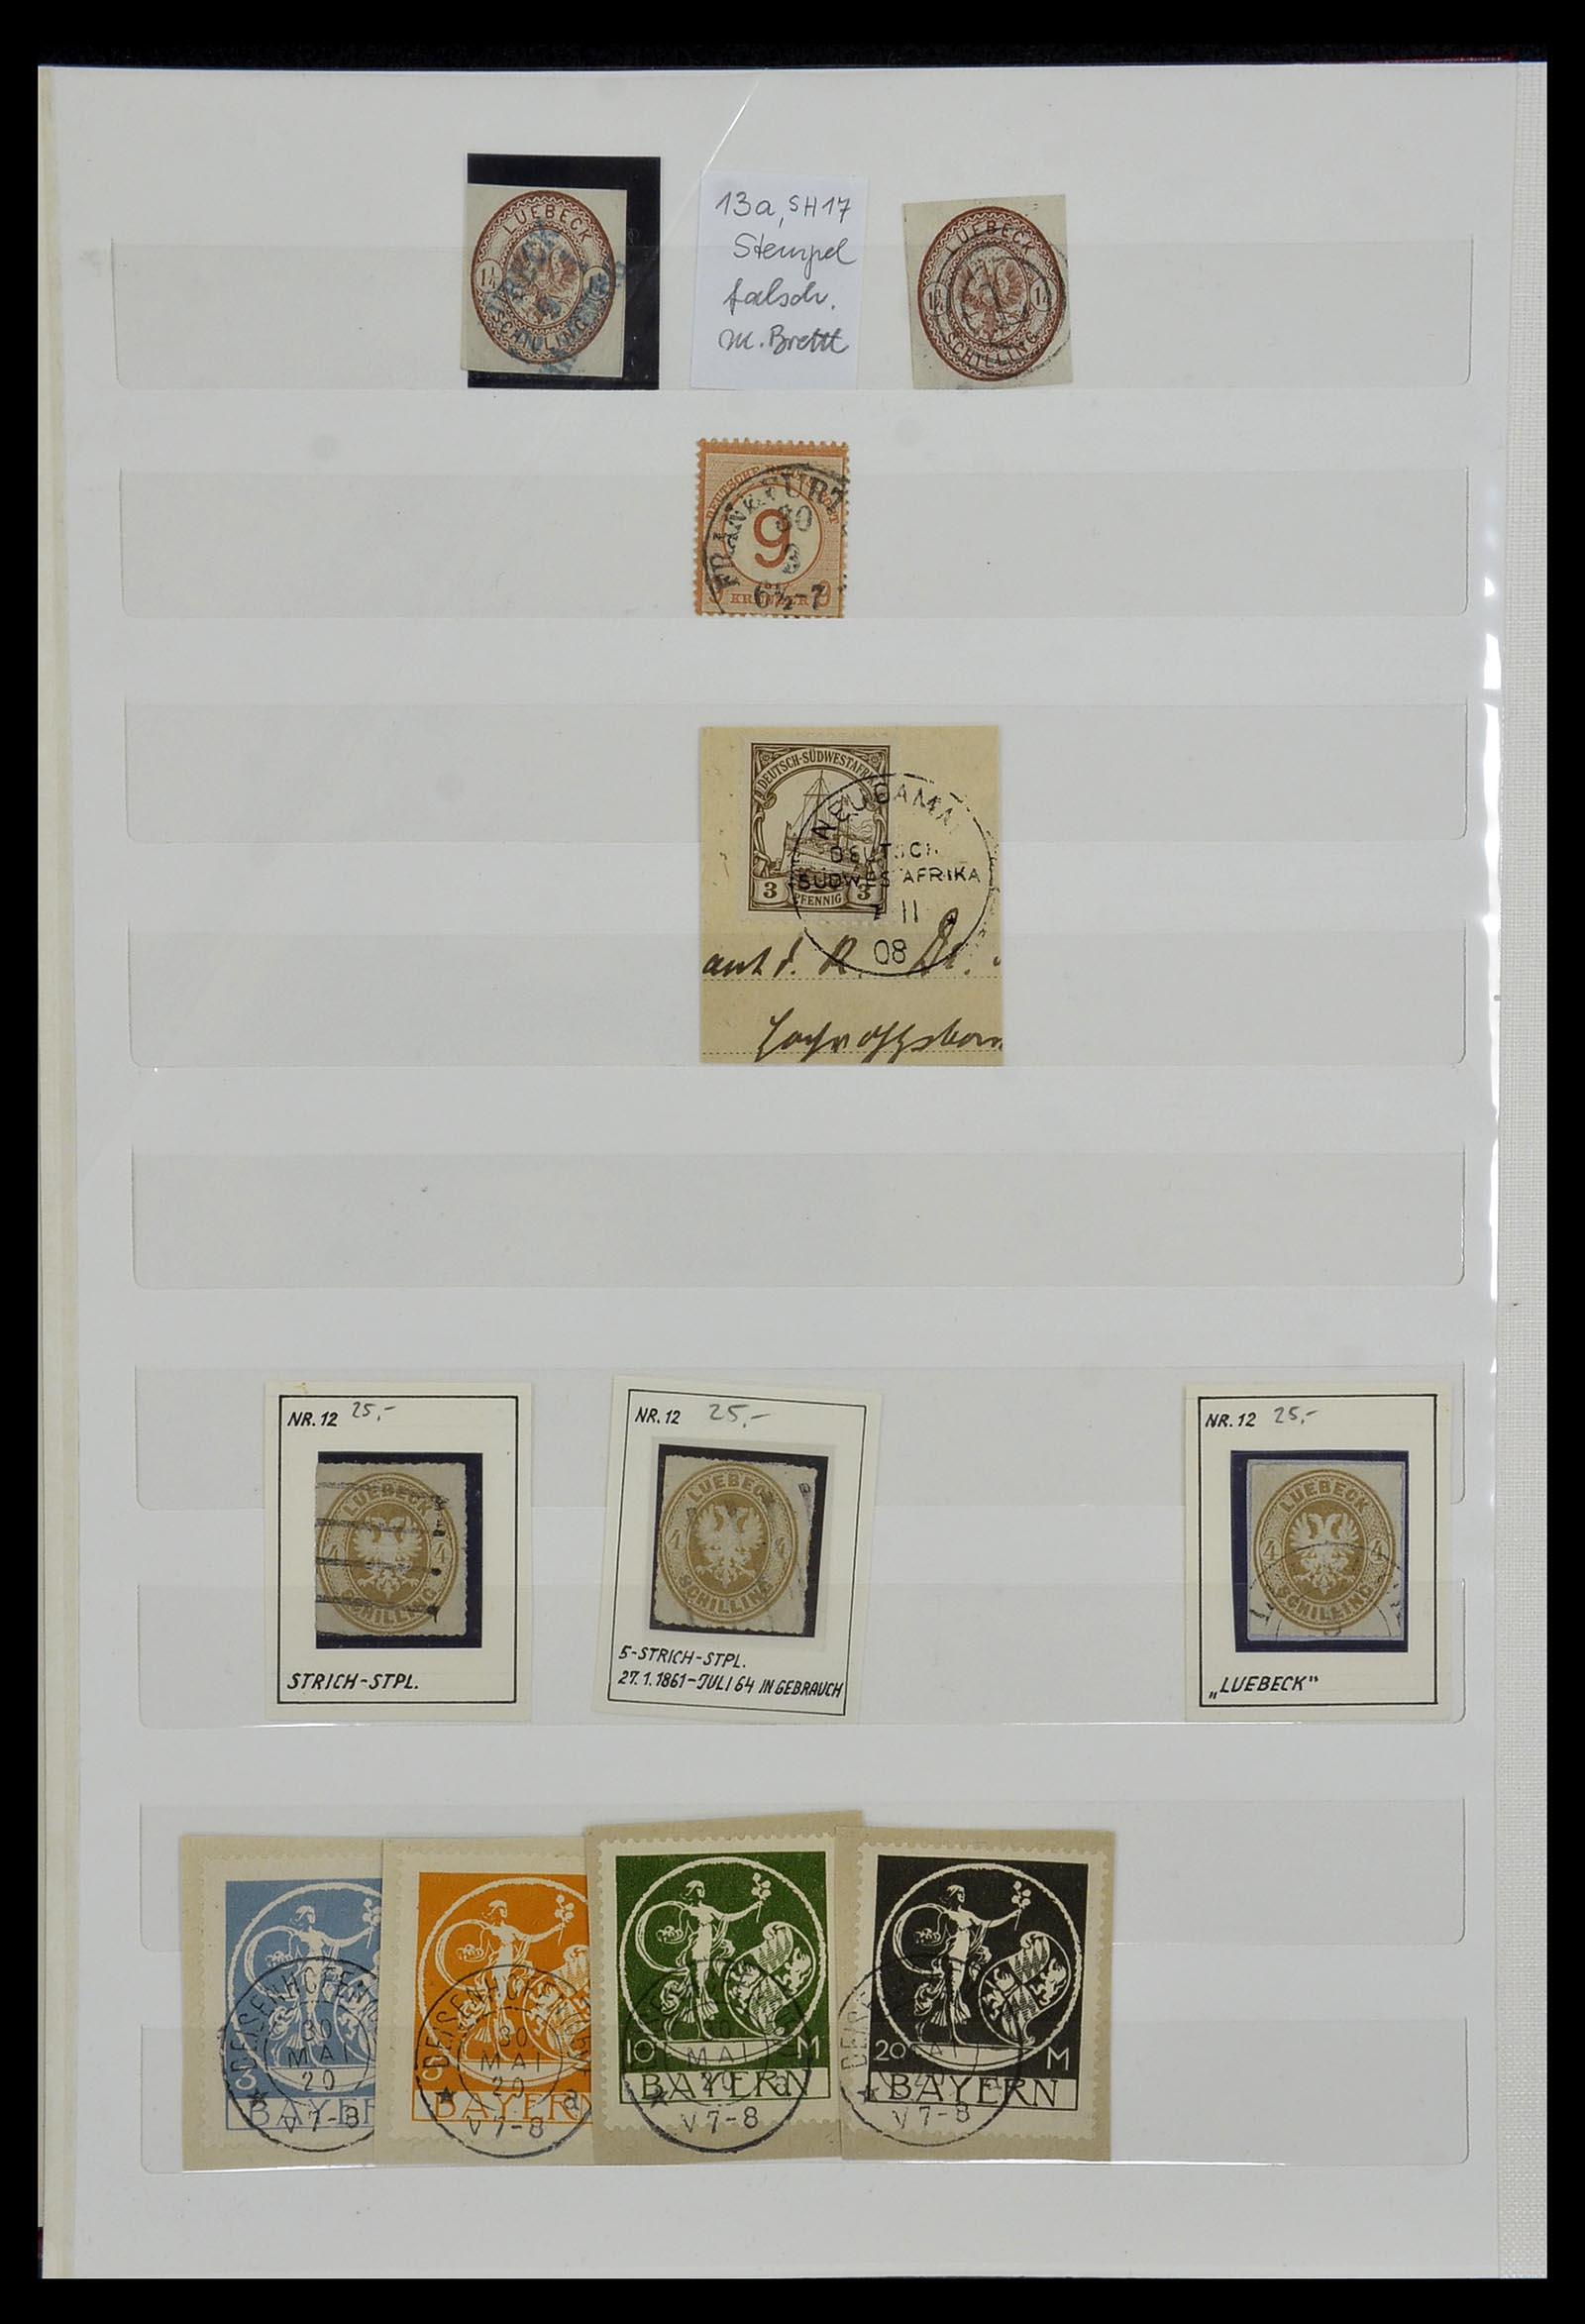 34069 004 - Postzegelverzameling 34069 Duitsland 1855-1952.